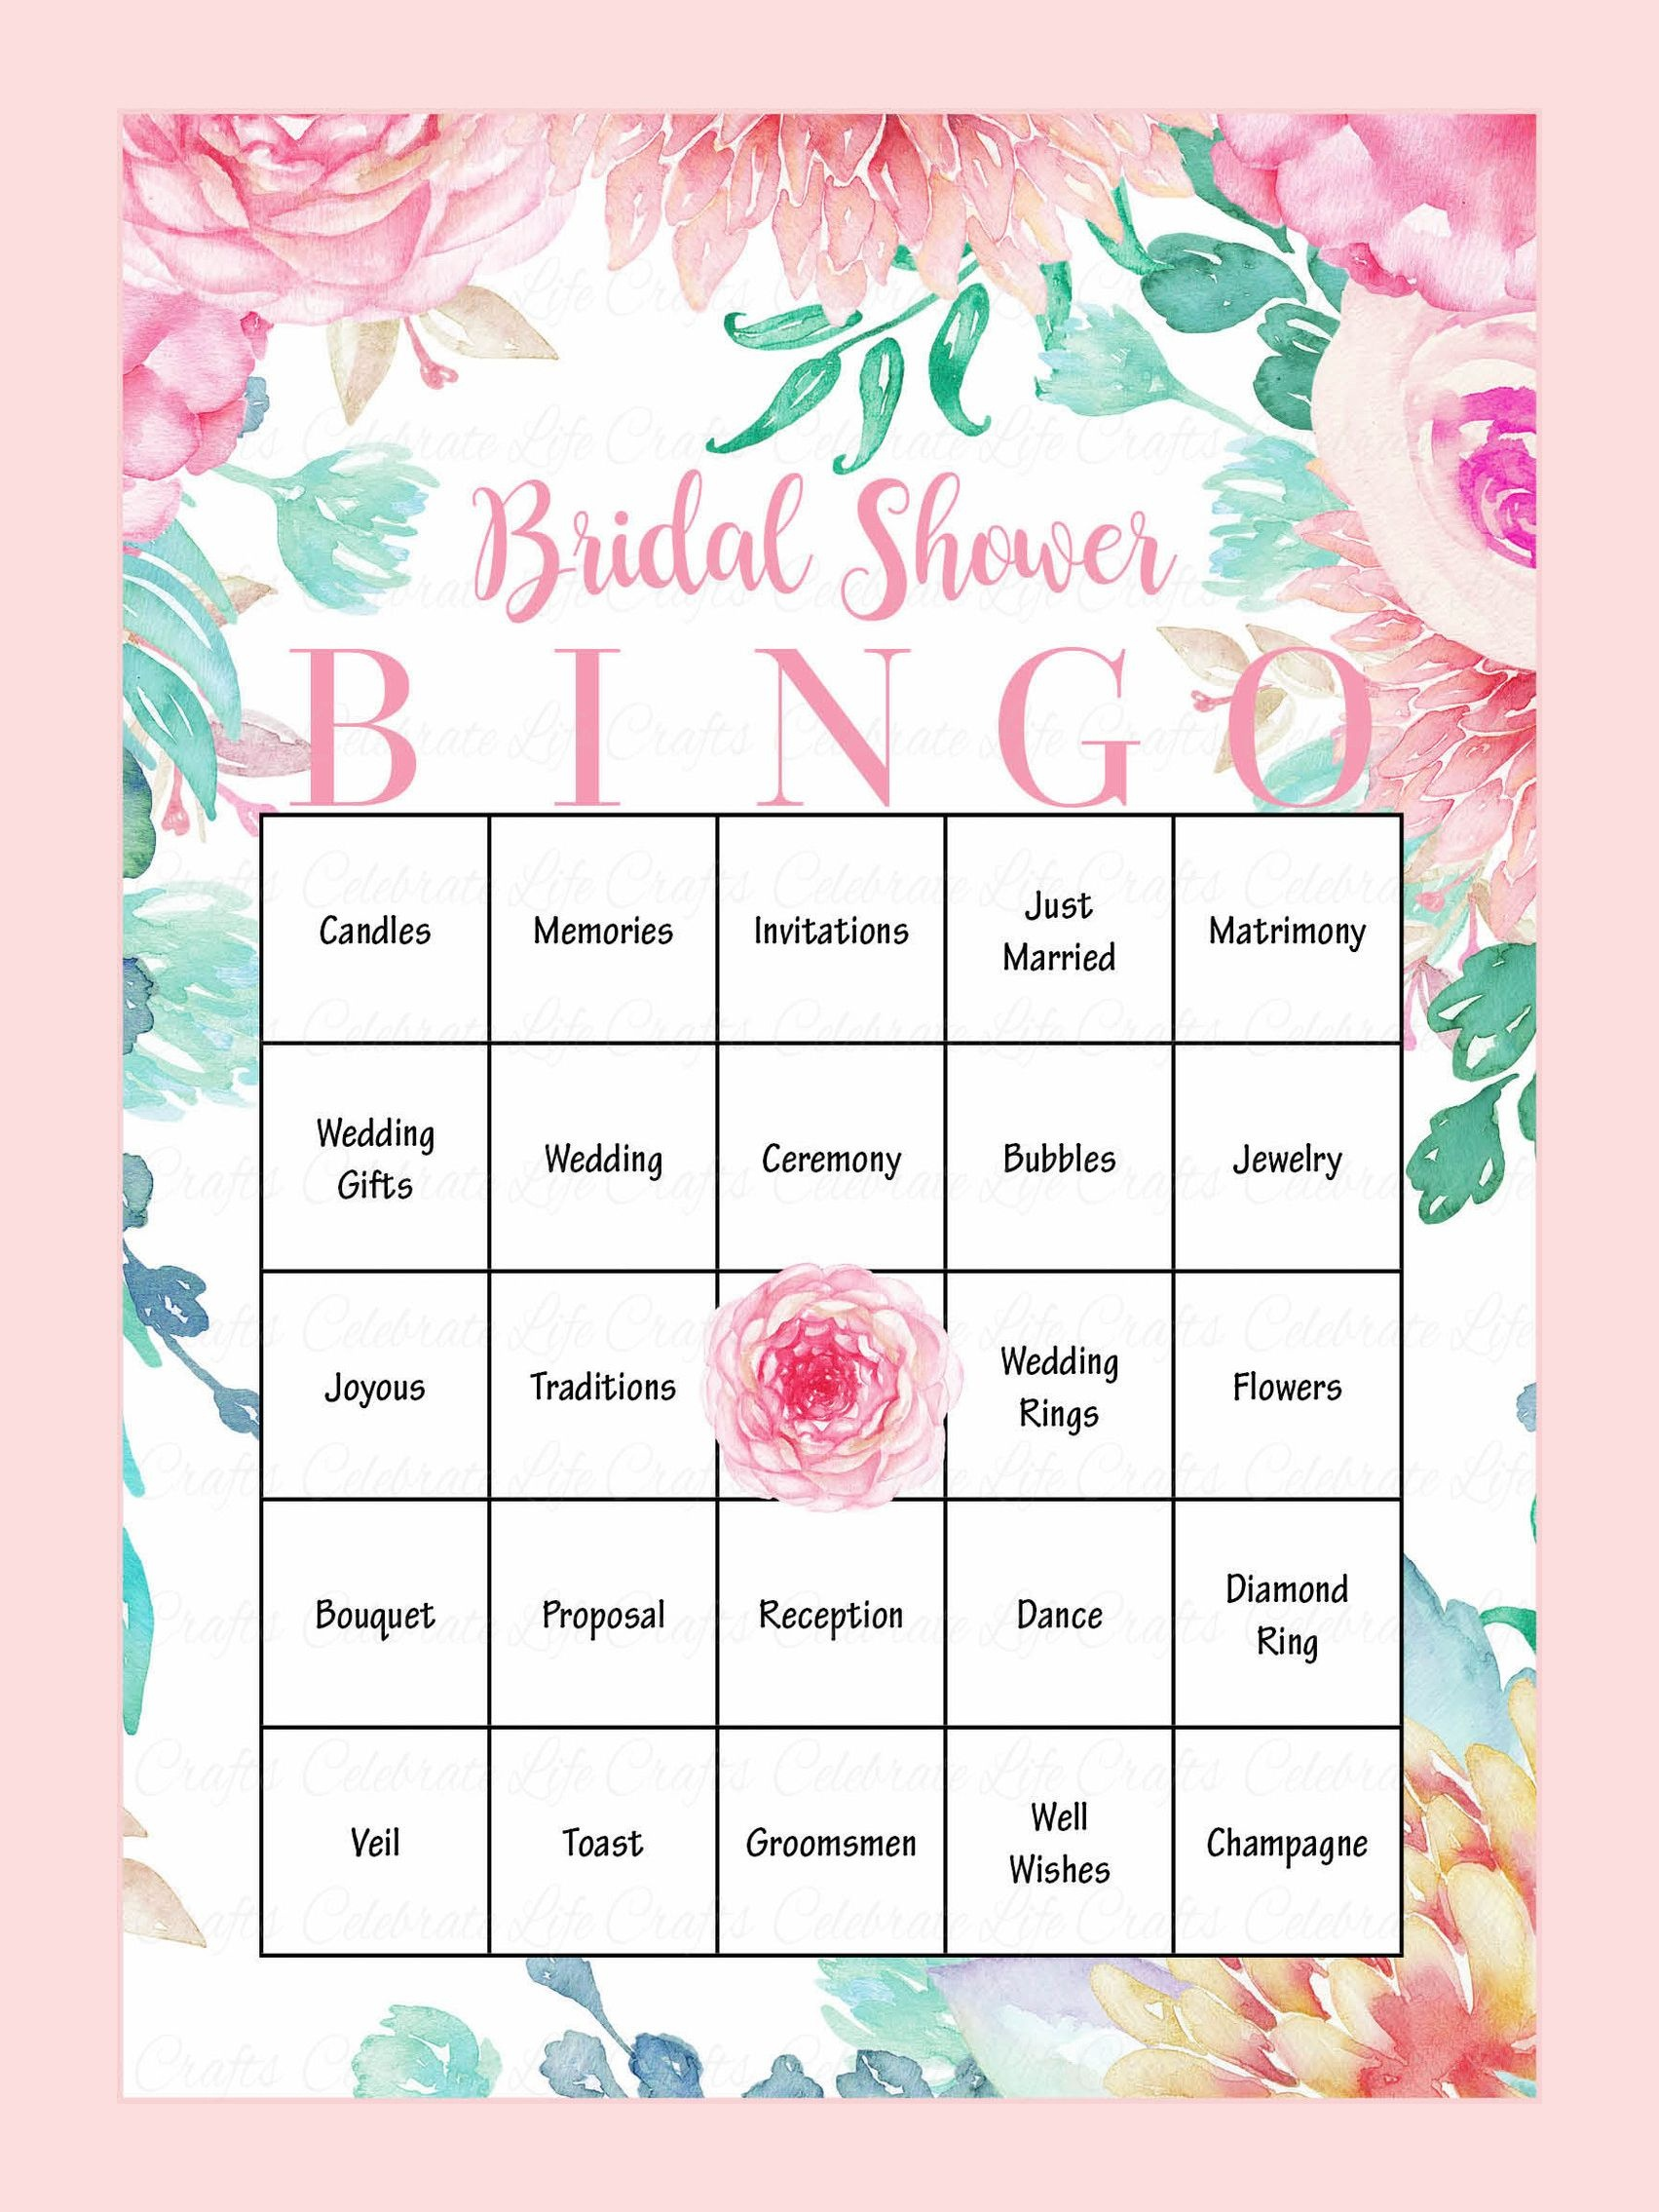 10 Printable Bridal Shower Games You Can Diy | Bridal Showers - Free Printable Bridal Shower Bingo